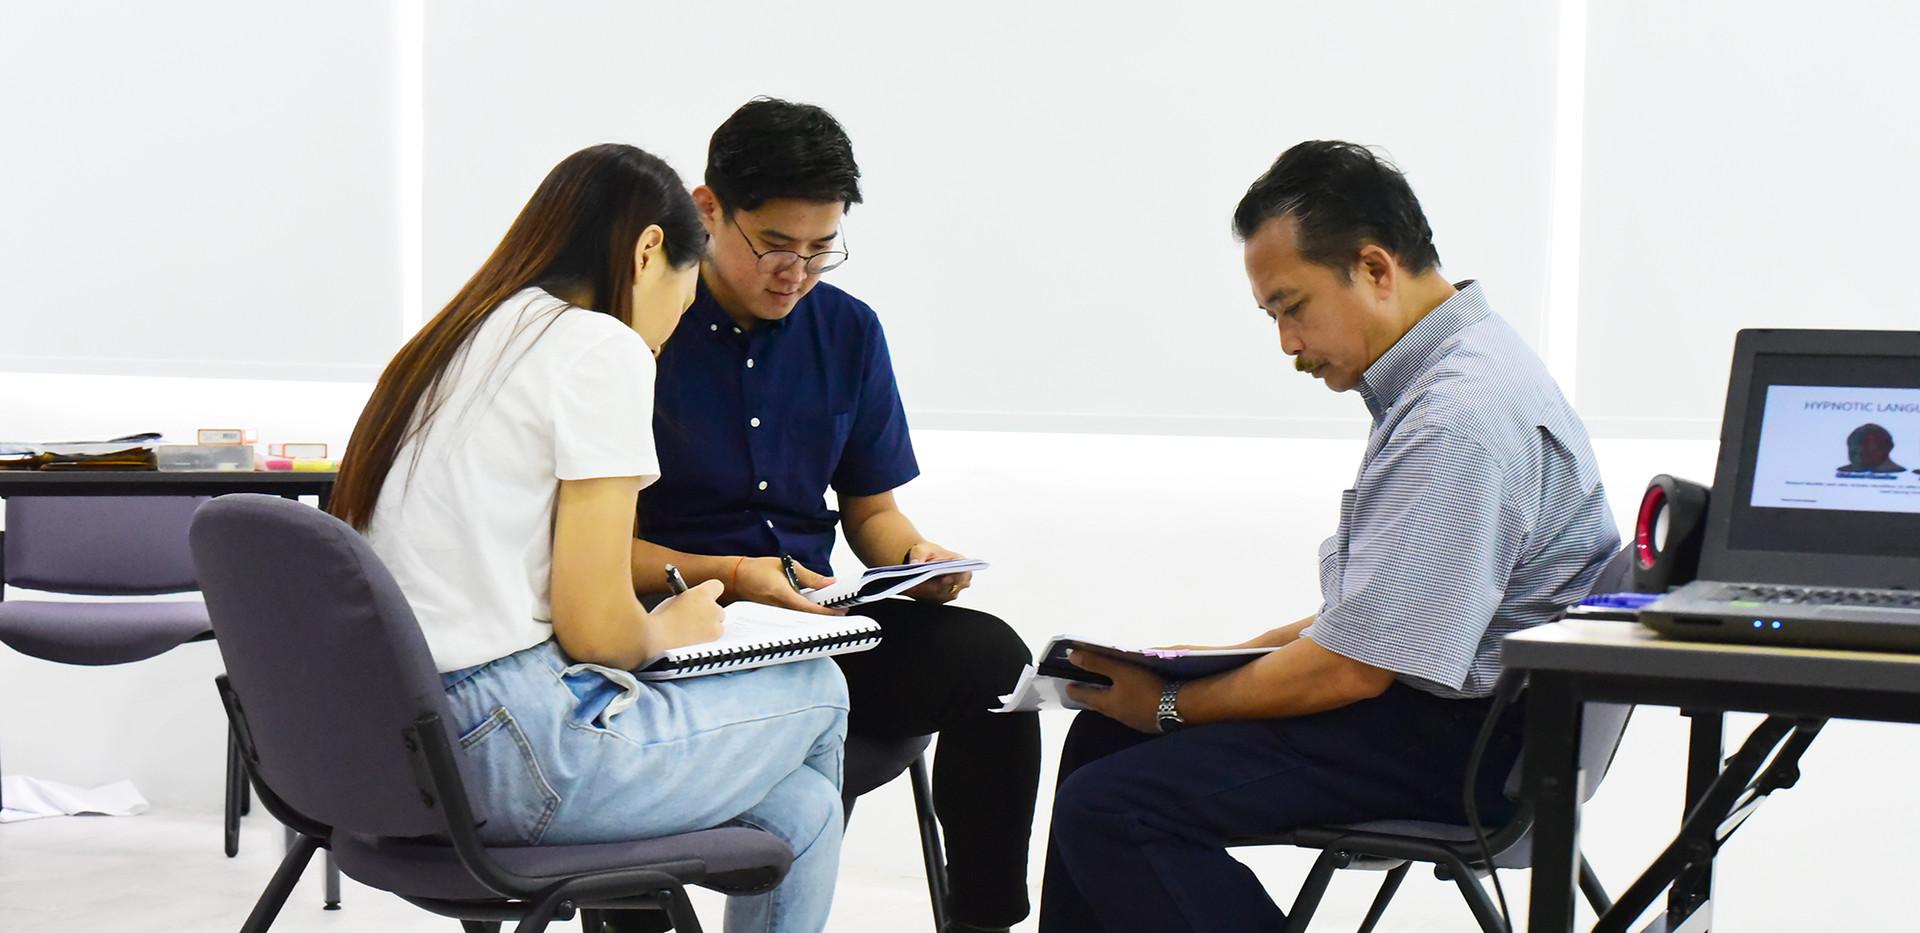 NLP CERTIFICATION PROGRAM - TALENT COACH